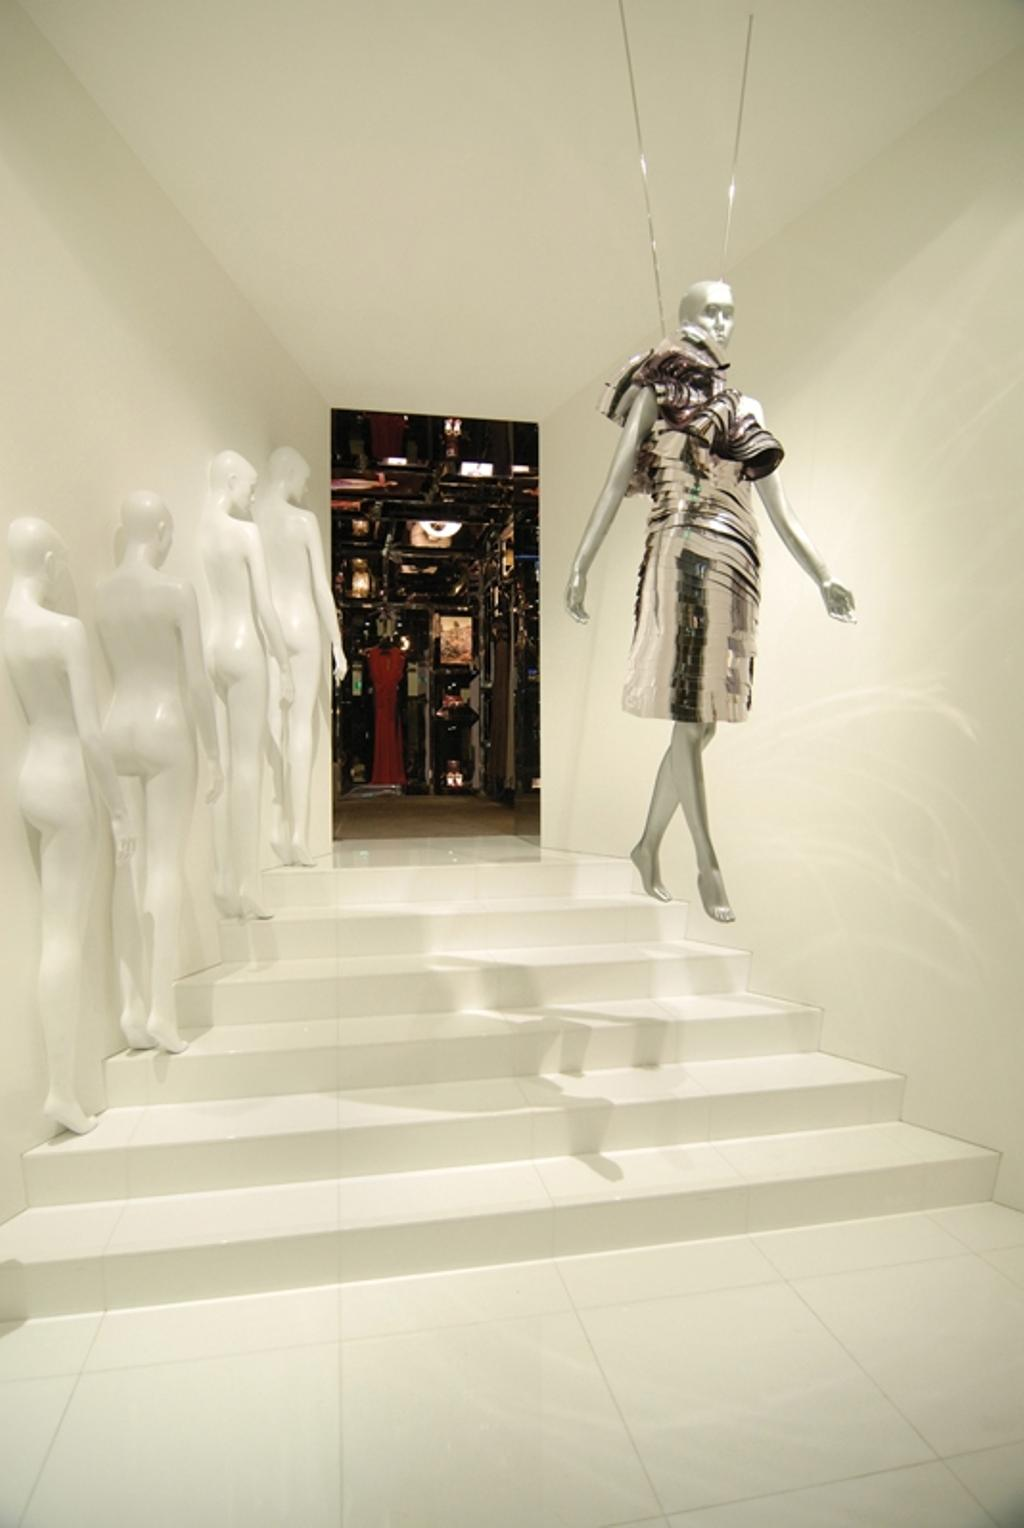 Ashley Isham Fullerton, Commercial, Architect, Ministry of Design, Modern, Figurine, Mannequins, White Steps, White Flooring, White Walls, Human, People, Person, Mannequin, Art, Sculpture